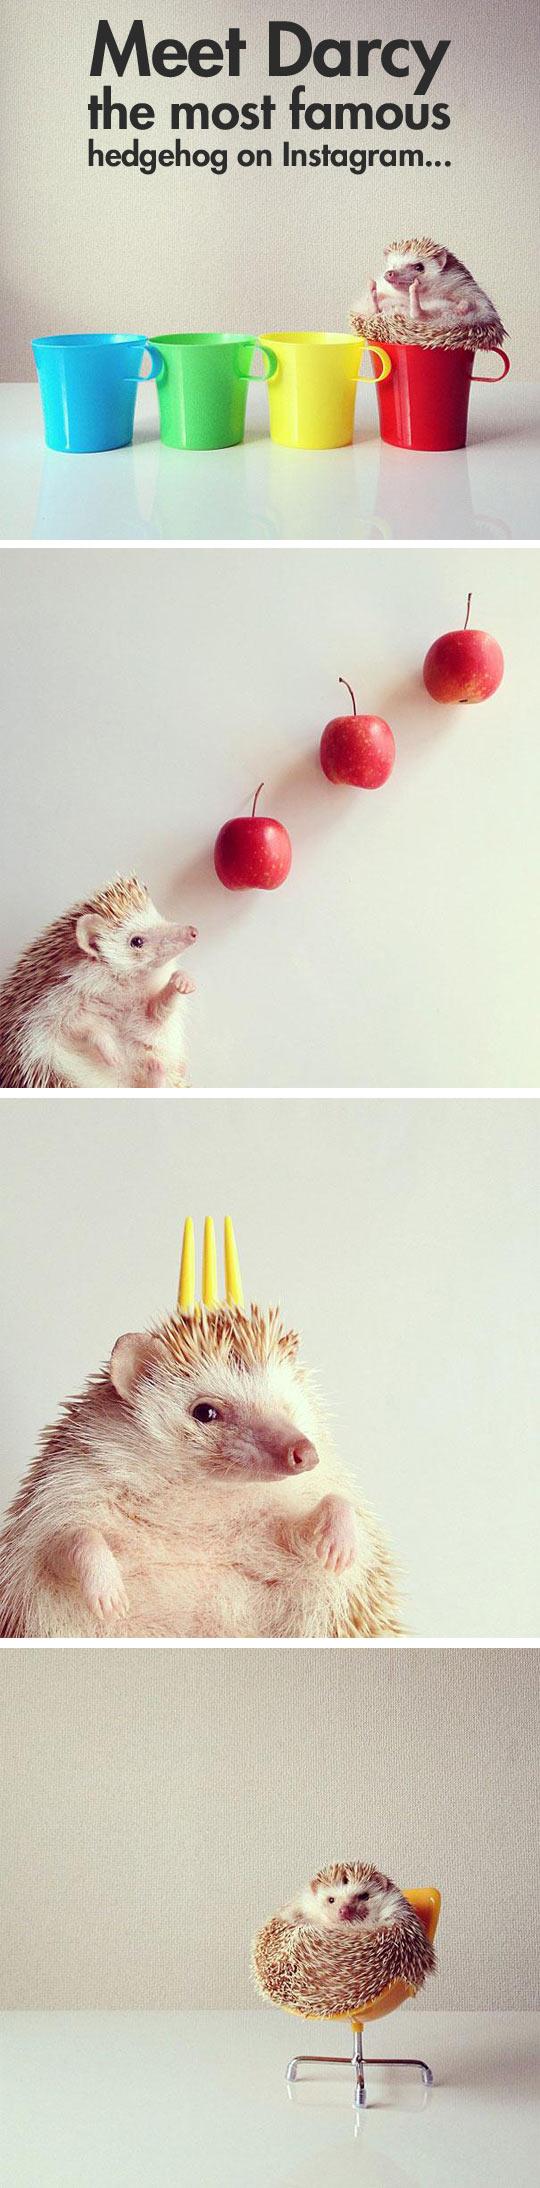 cute-hedgehog-Instagram-Darcy-hand